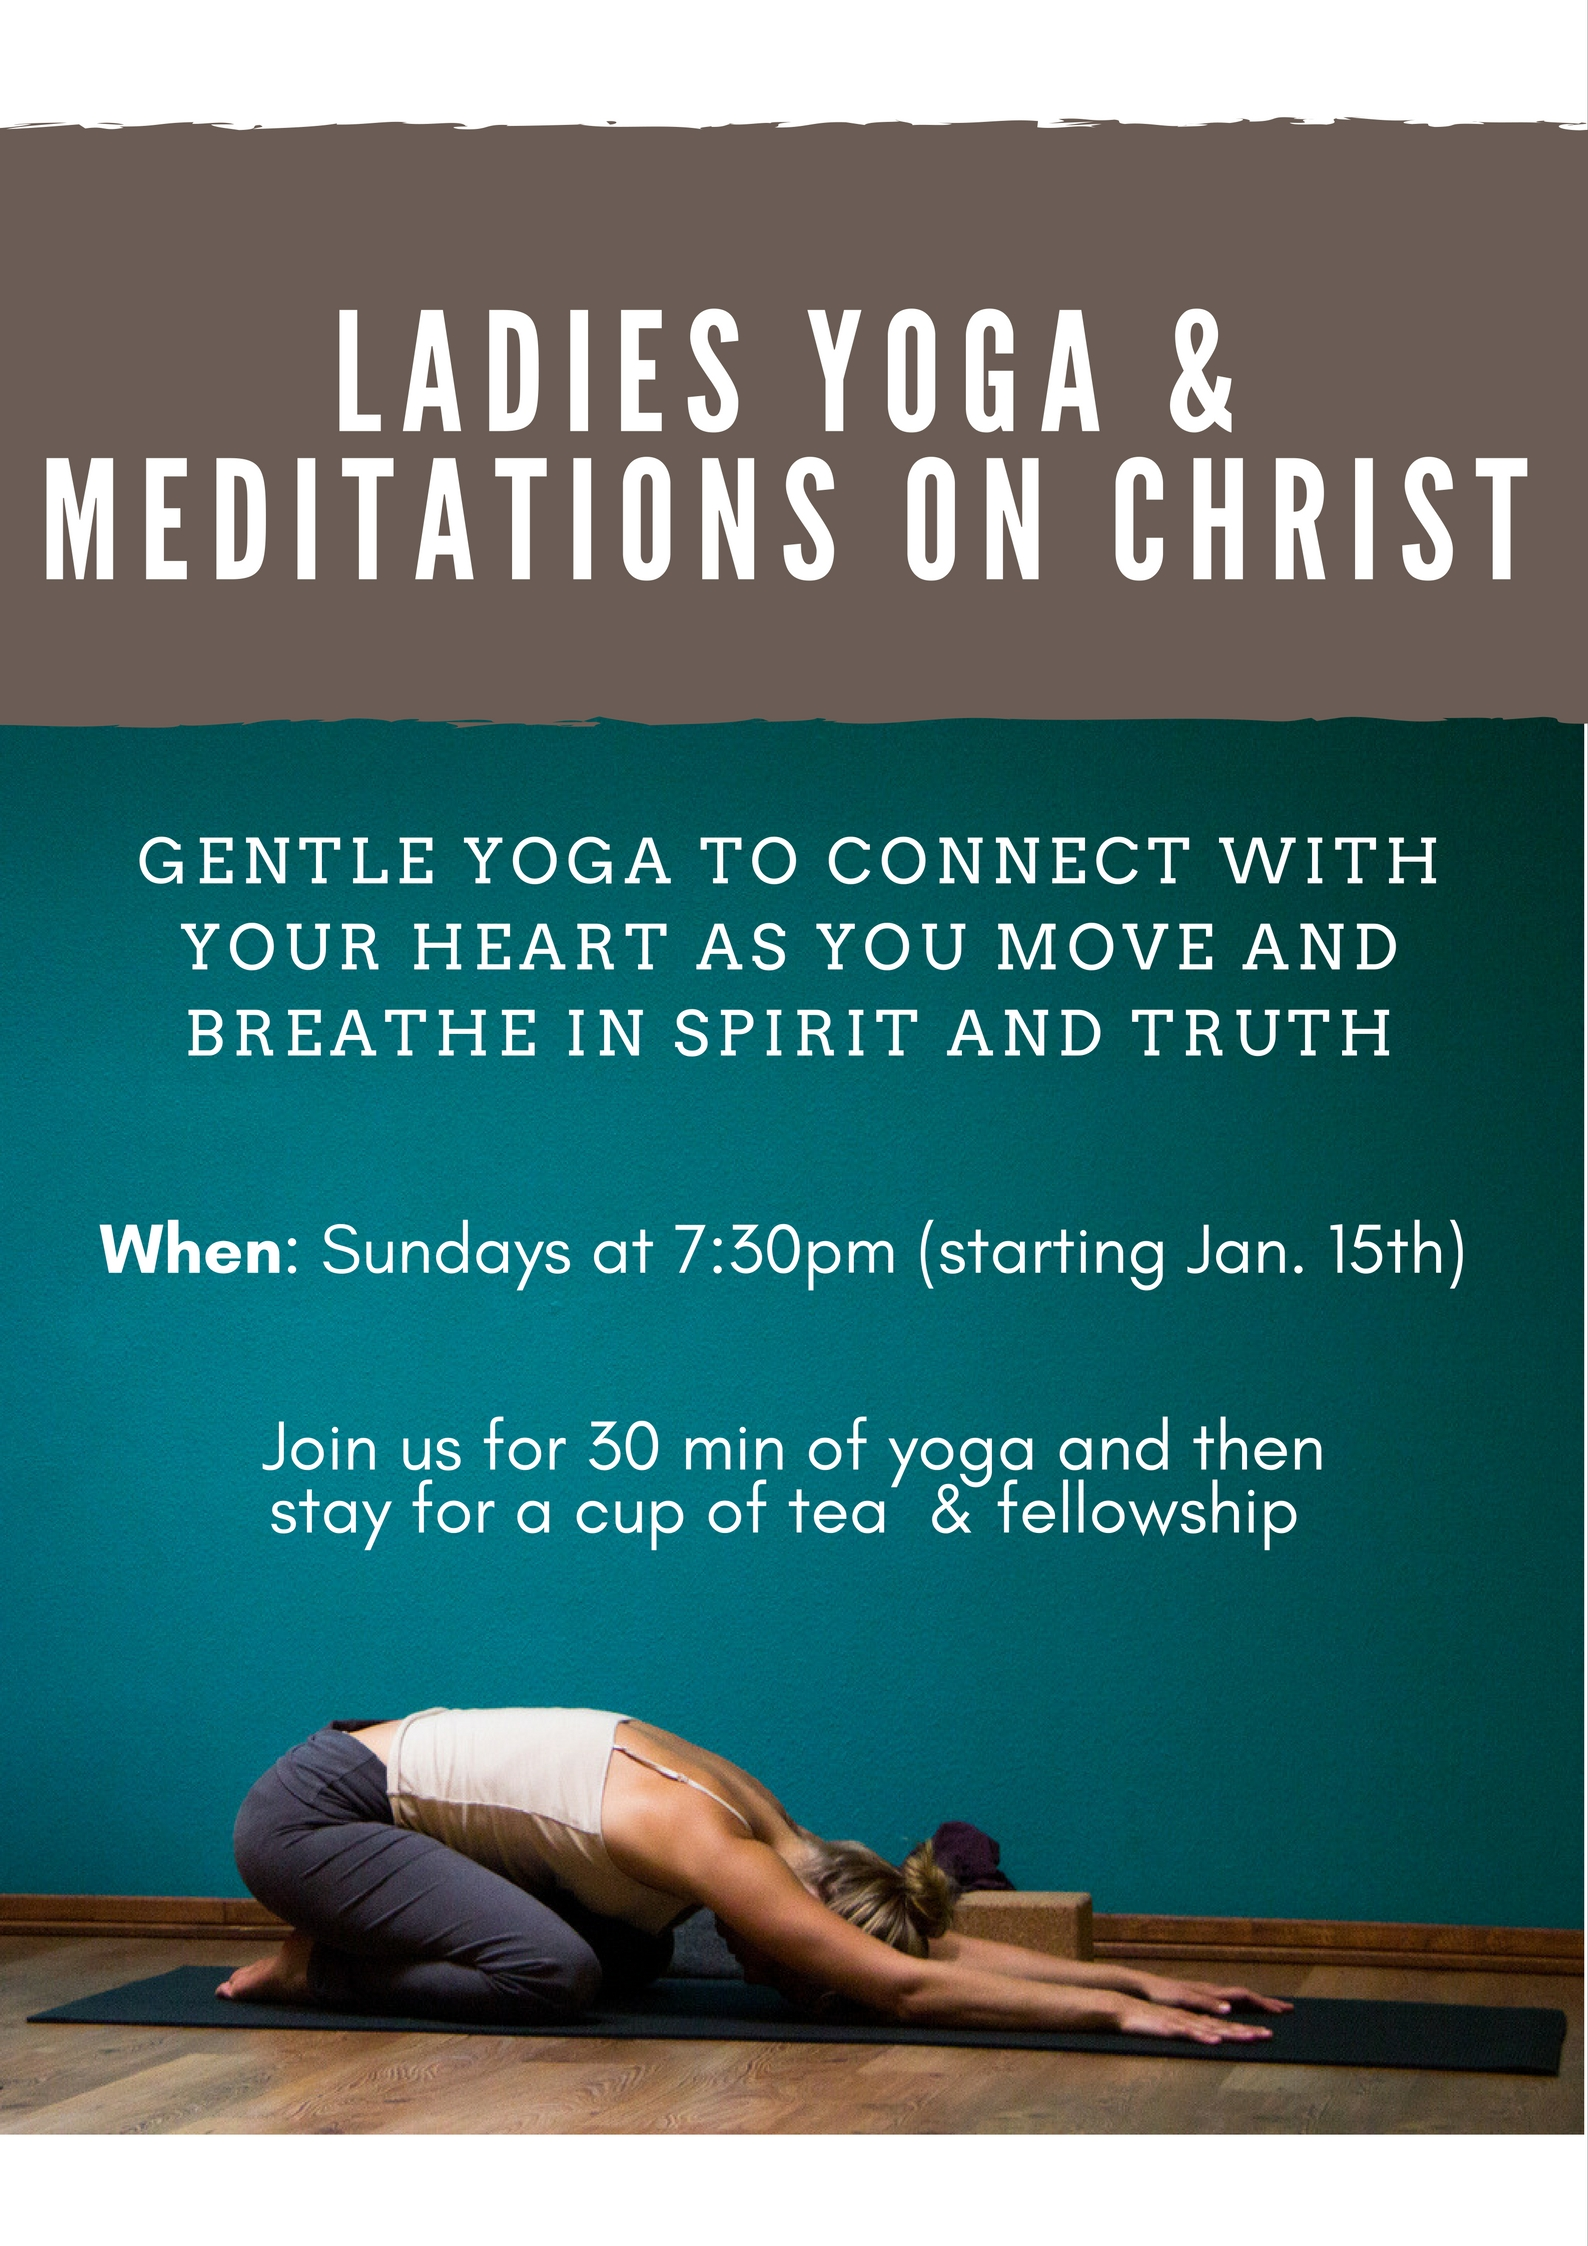 yoga-lisa-rutledge-woodlands-midwife.jpg